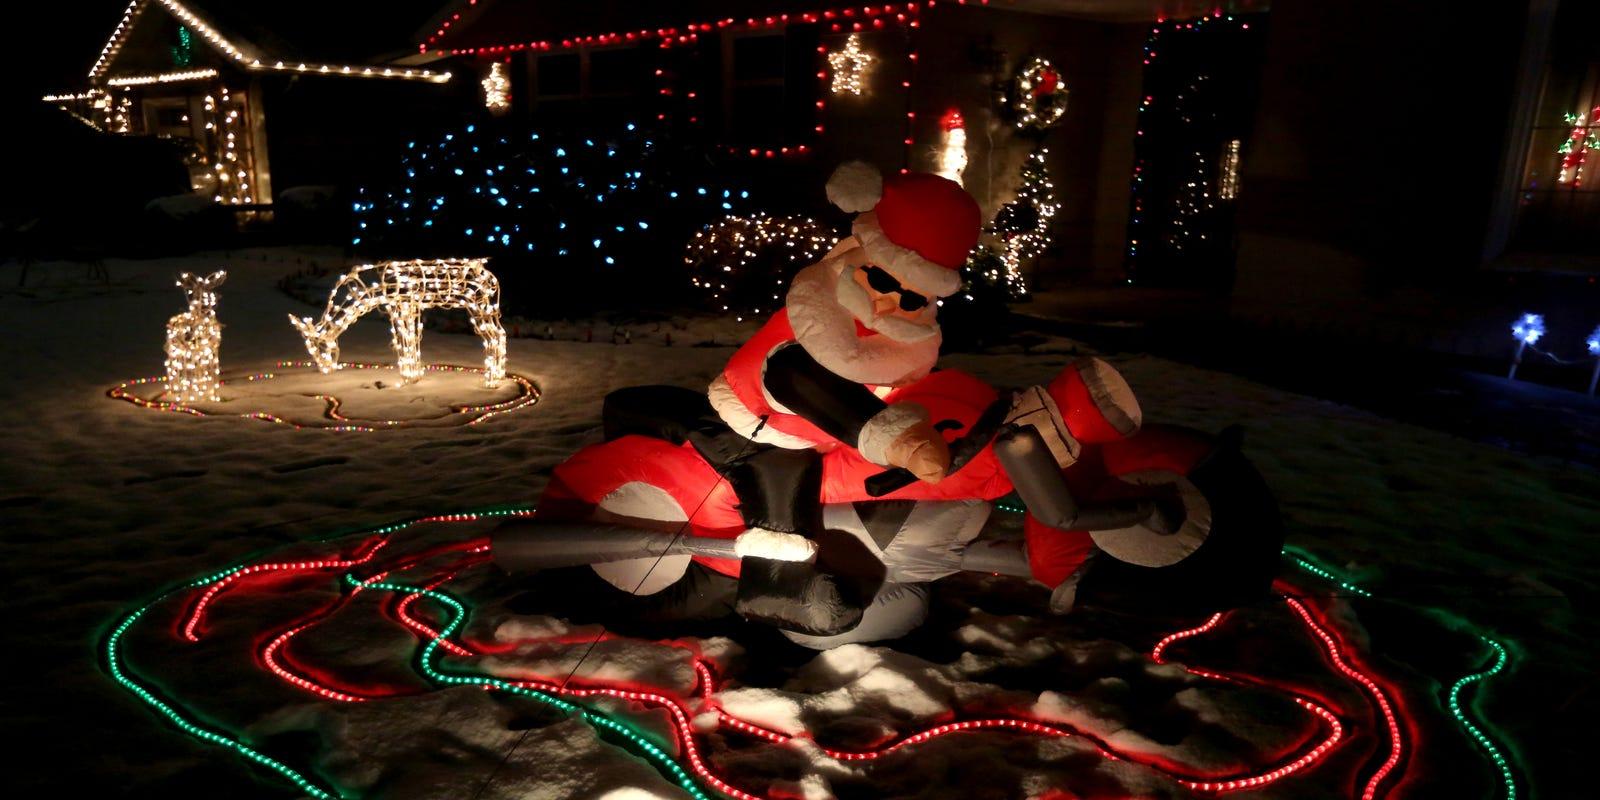 Keizer Miracle of Christmas lights display